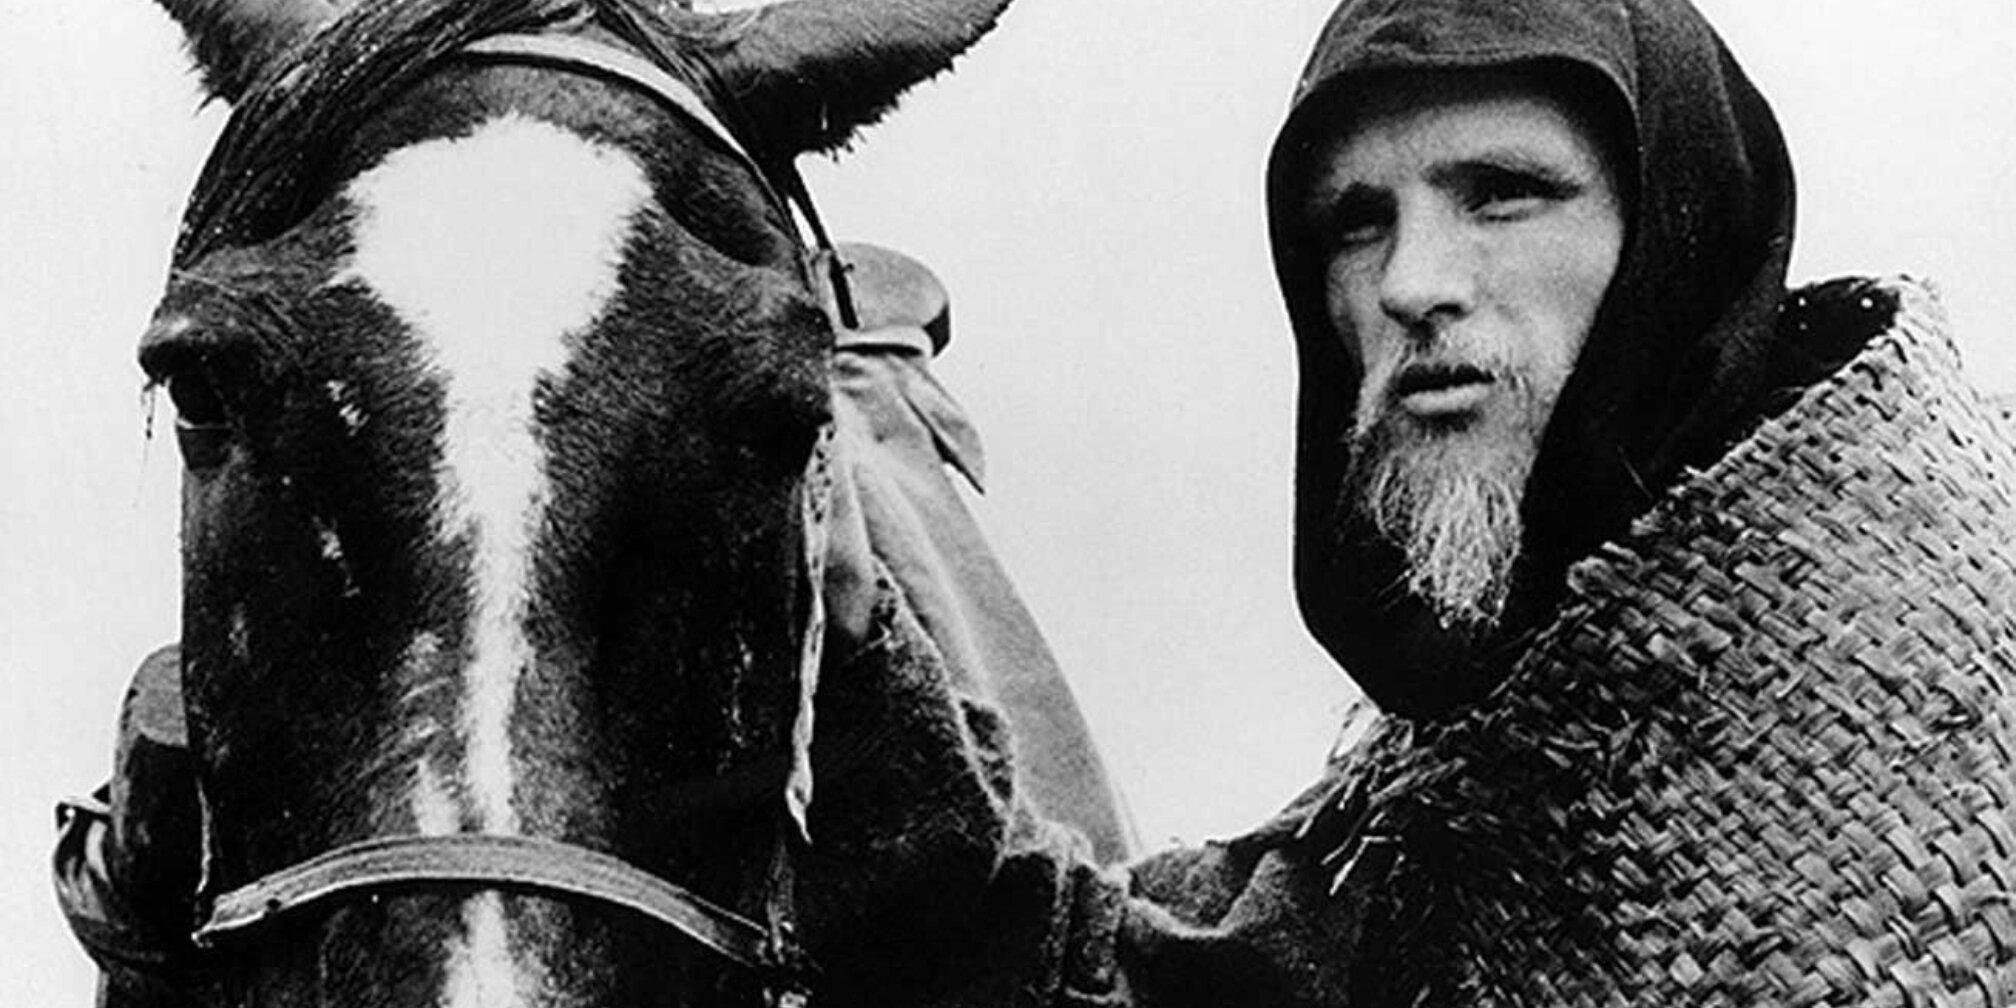 Andrei Tarkovsky's Andrei Rublev